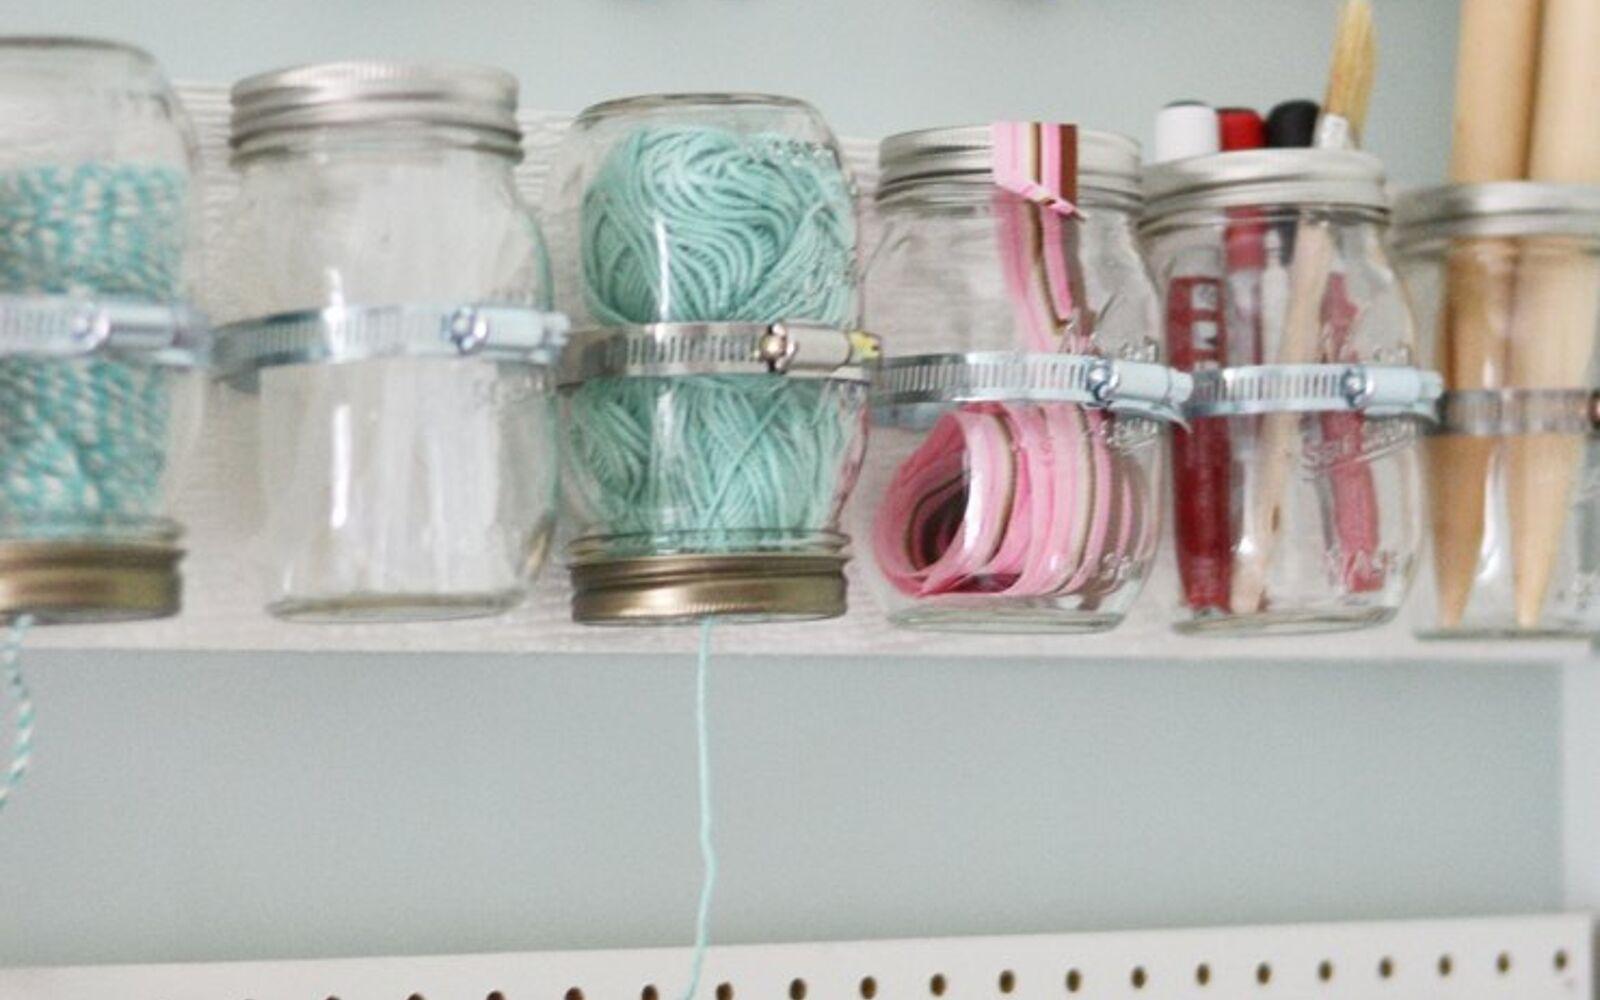 s 30 great mason jar ideas you have to try, Crafty Creative Shelf Idea